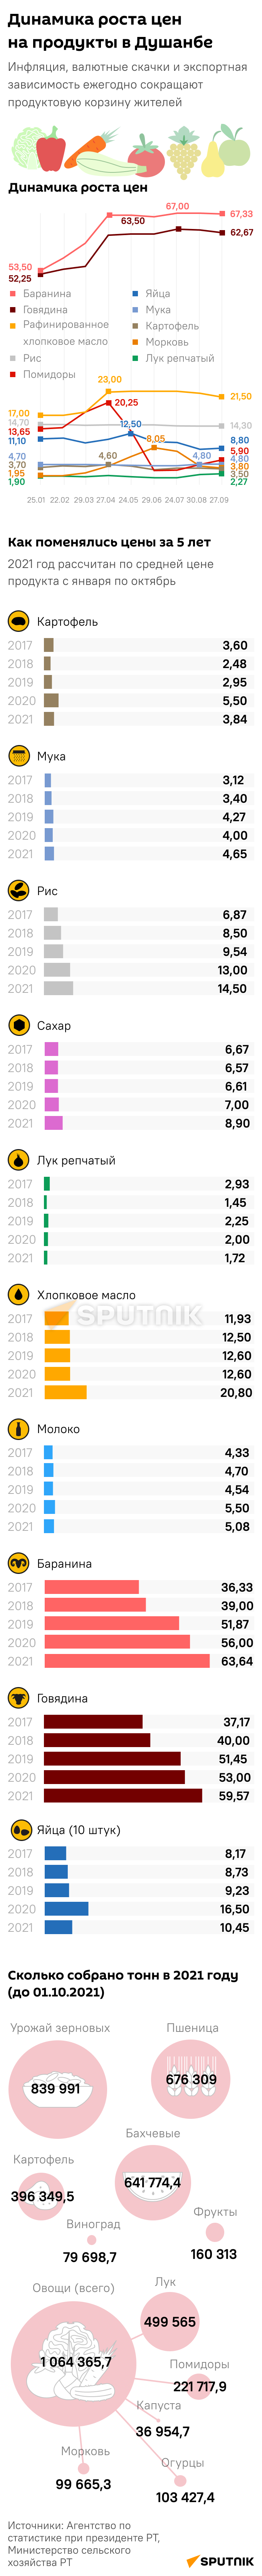 Динамика цен на продукты mob - Sputnik Таджикистан